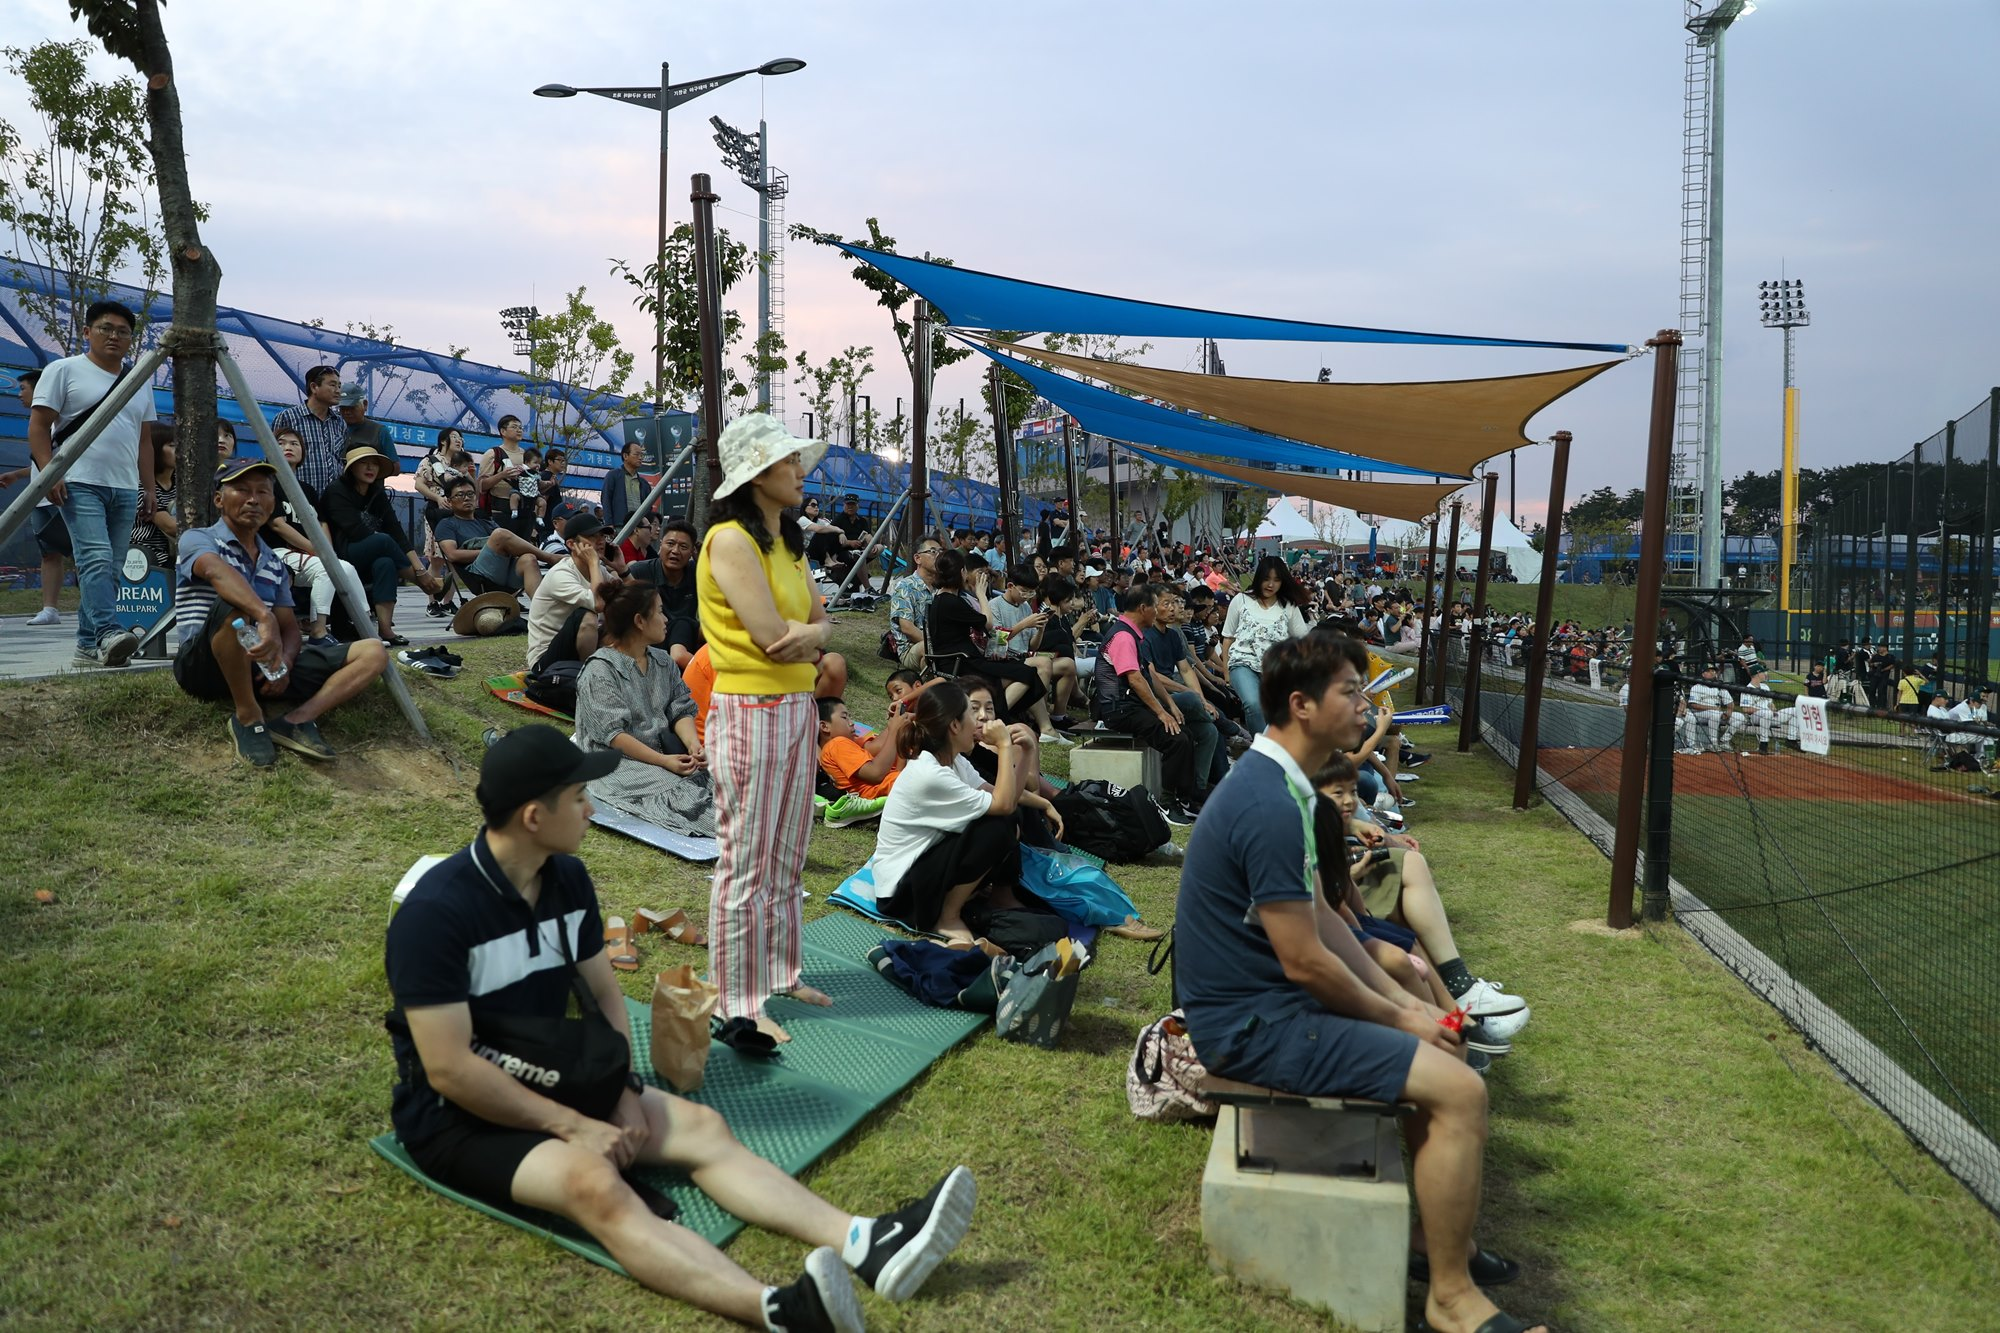 Korean fans at the Dream Ballpark